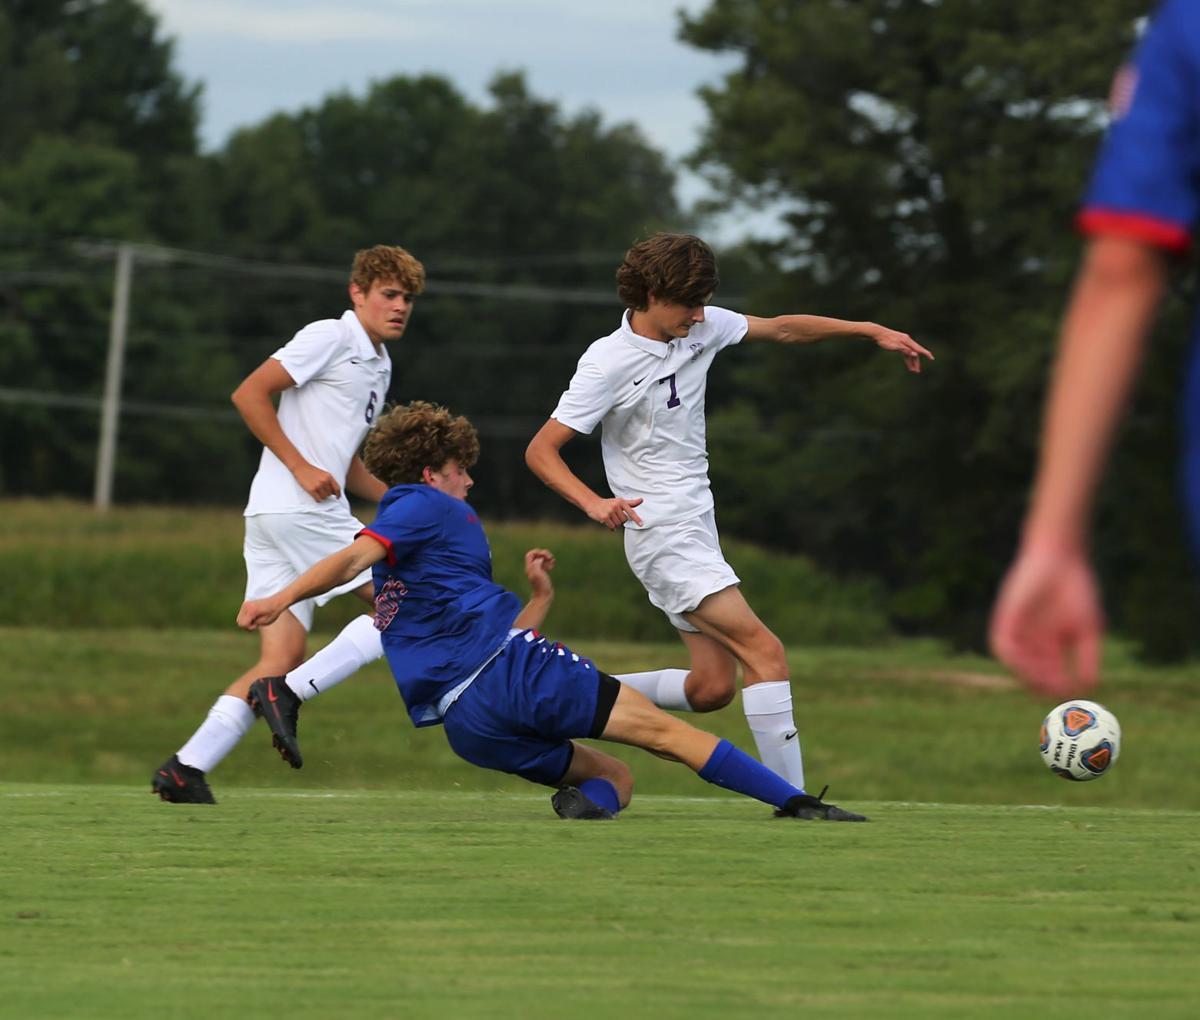 METSPTS-09-02-21 MCHS Soccer vs Harrisburg_PHOTO 1